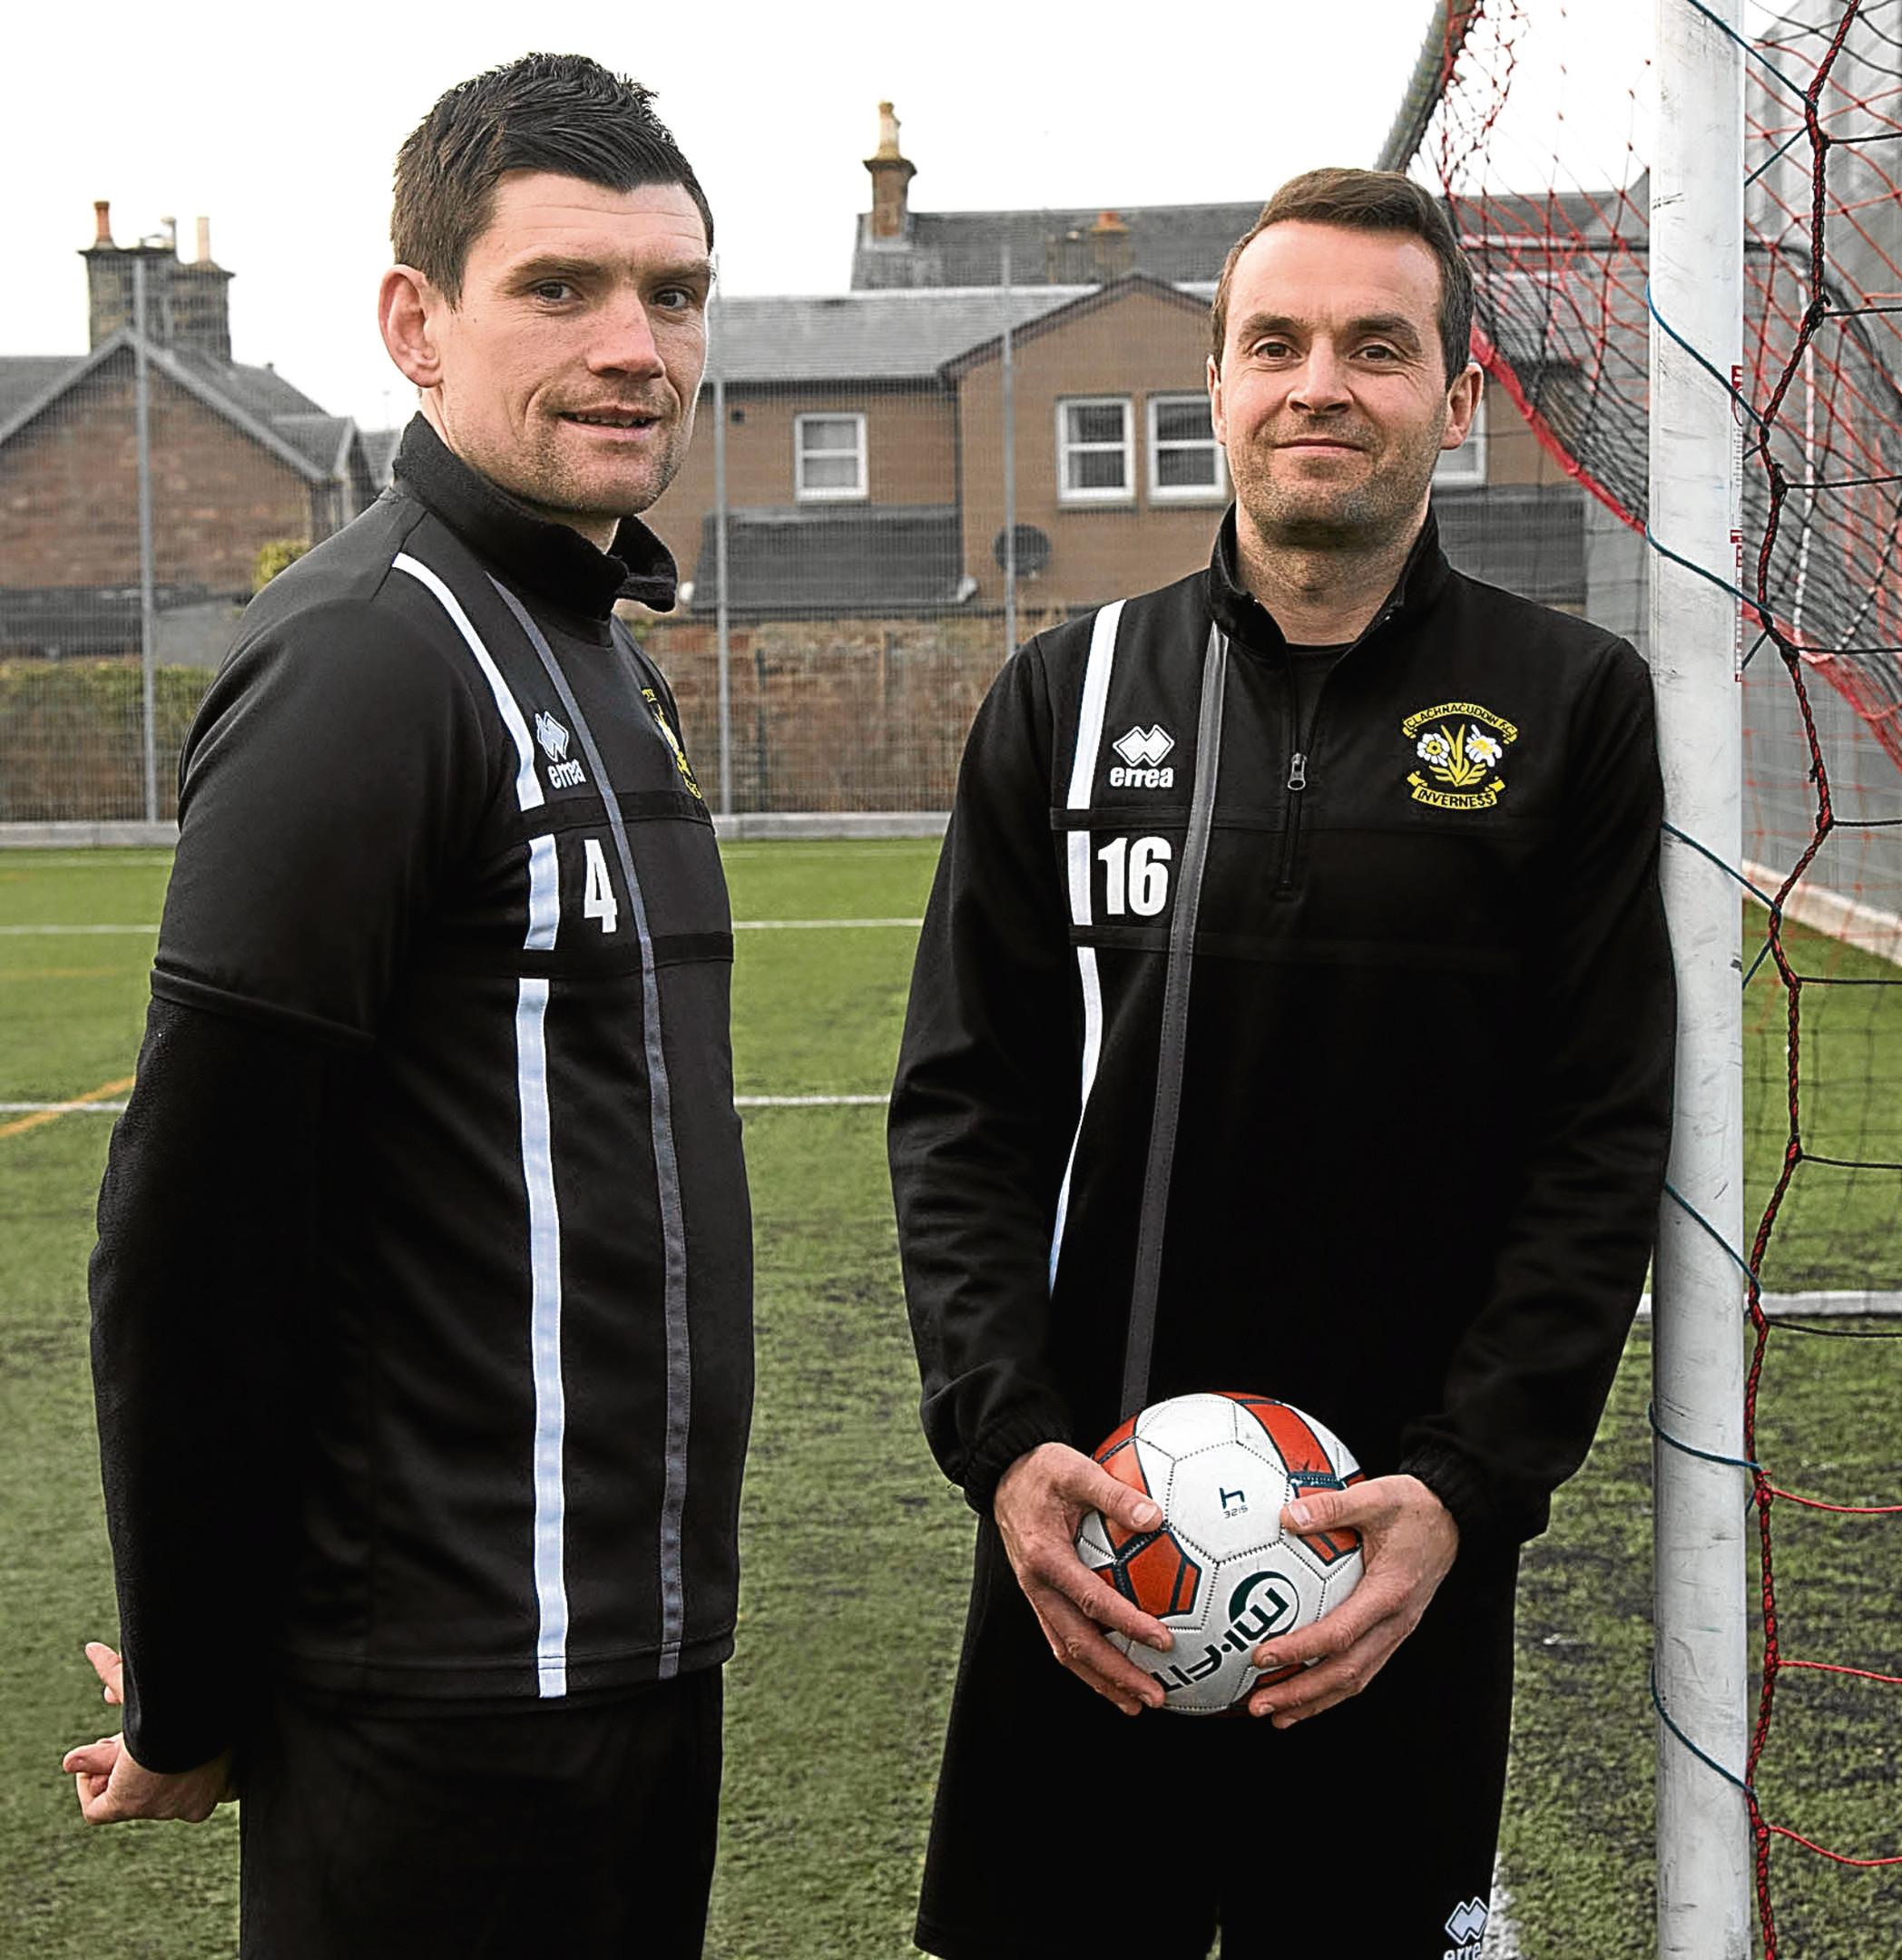 Sean Webb and Martin MacDonald both left Clach this summer